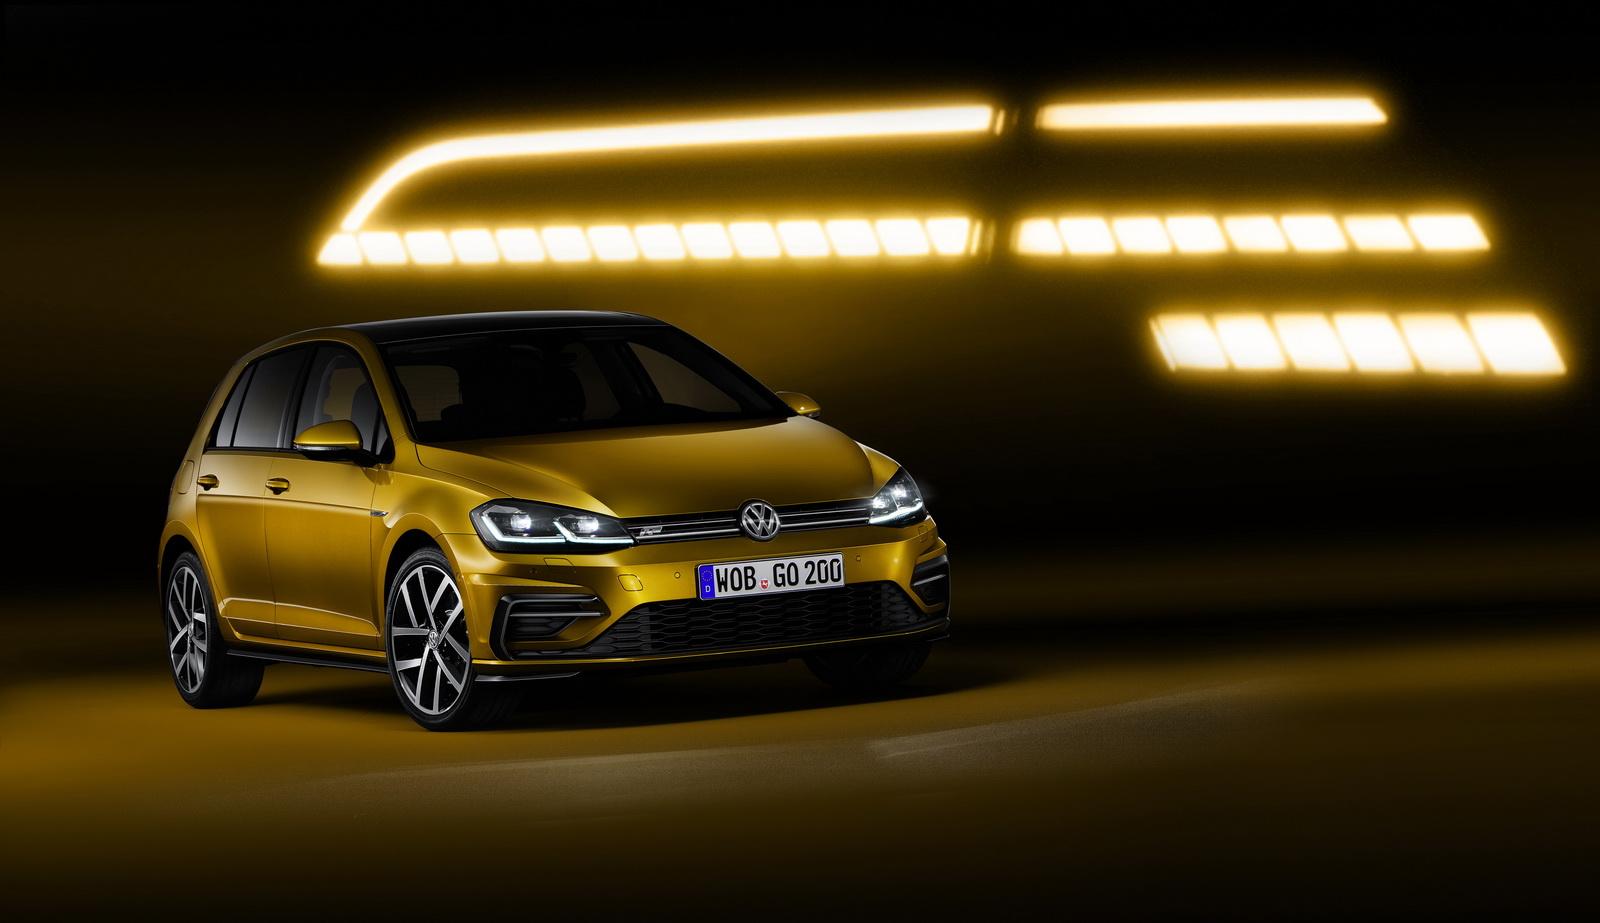 2017 Volkswagen Golf Sportwagen Tsi S >> 2017 VW Golf Facelift Debuts With 1.5 TSI, LED Headlights and Golden Paint - autoevolution